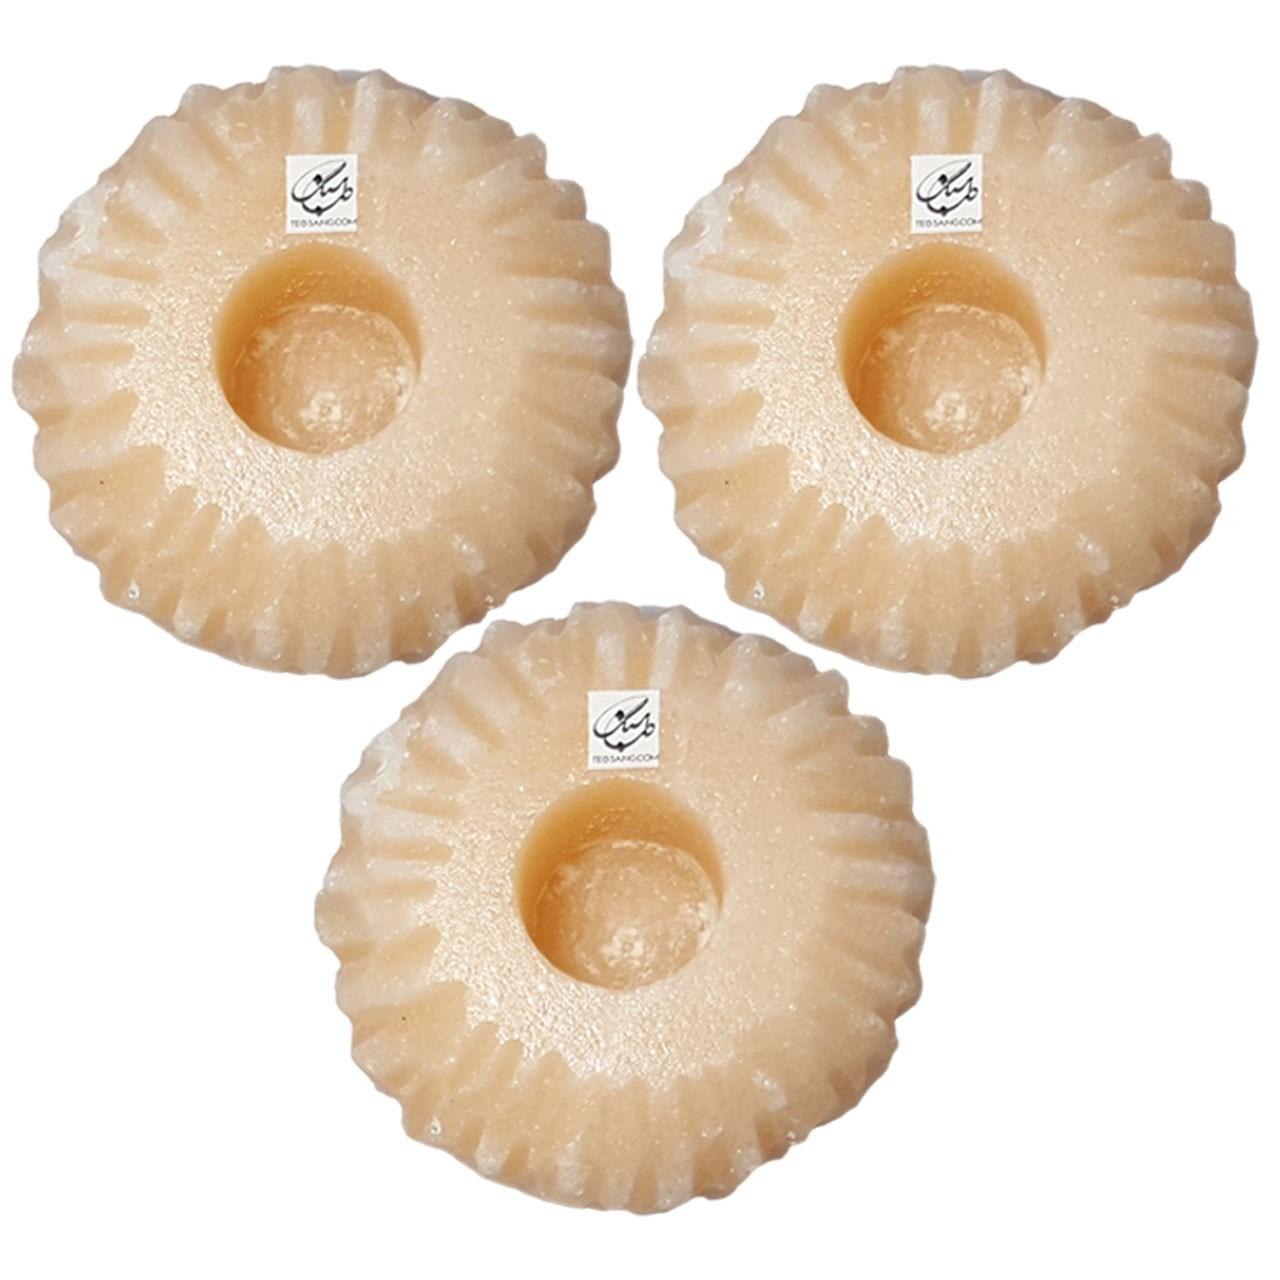 خرید                      شمعدان سنگ نمک طب سنگ طرح جاشمعی آذرخش کد TC-40133 - بسته سه عددی